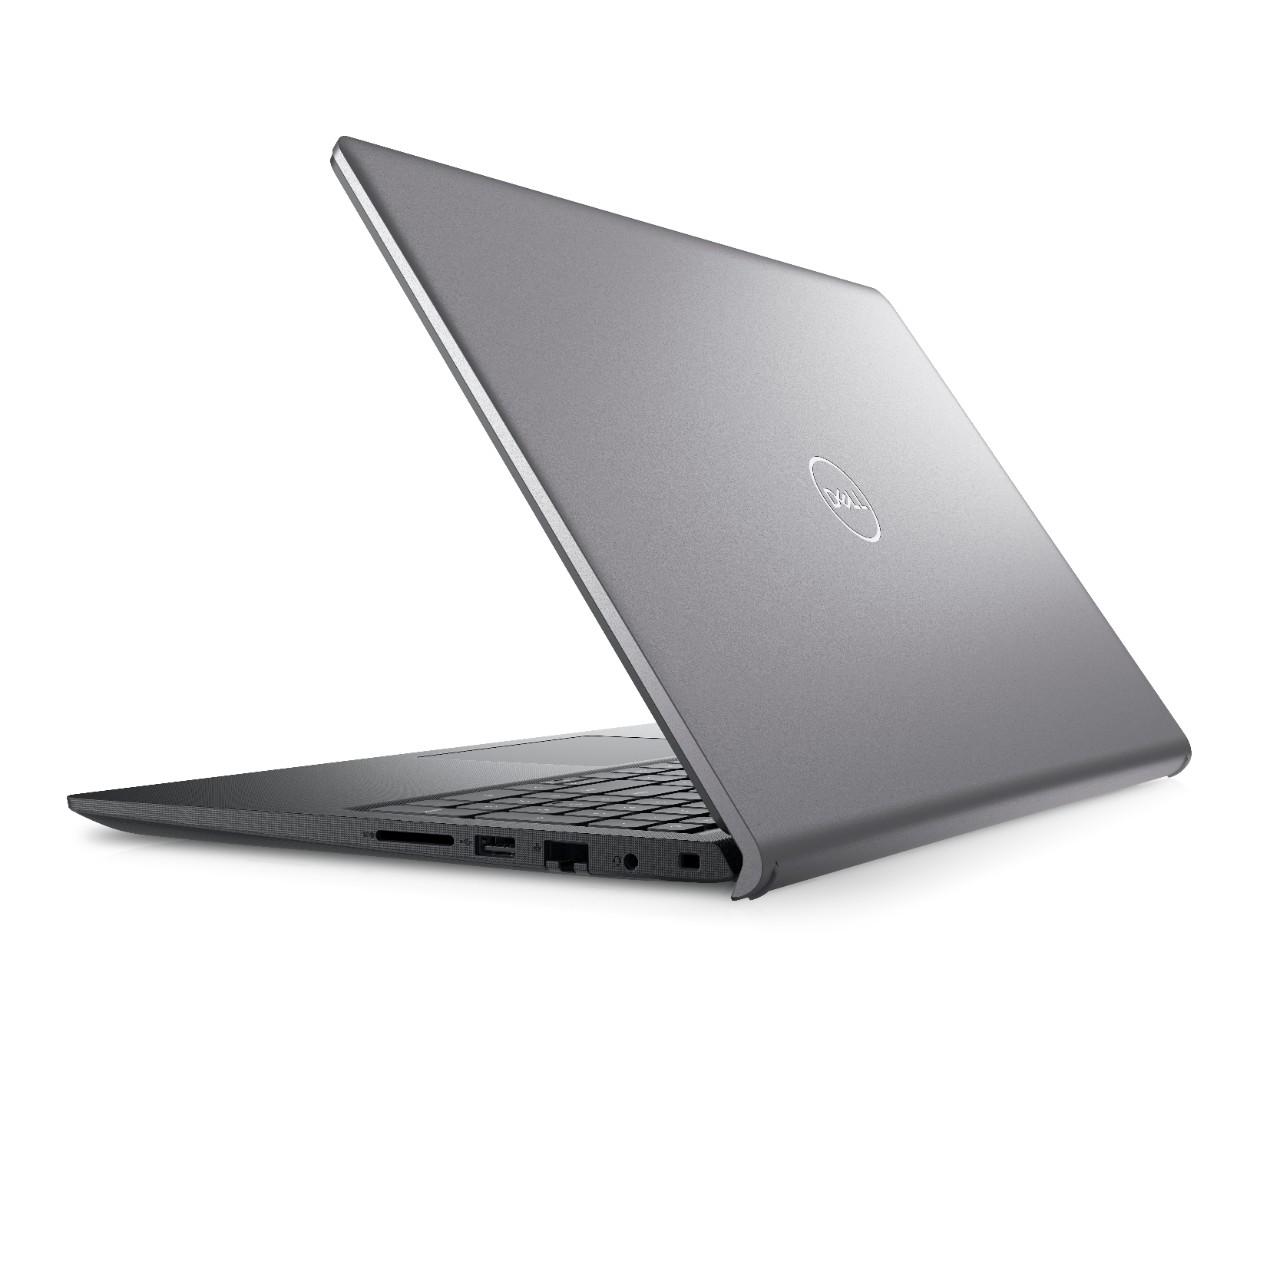 Dell Vostro 3515 15,6'' FHD AMD 7 3700U/16GB/512GB SSD/Vega 10/USB-C/FPR/MCR/HDMI/W10Pro/3RNBD/Černý - PRMDH